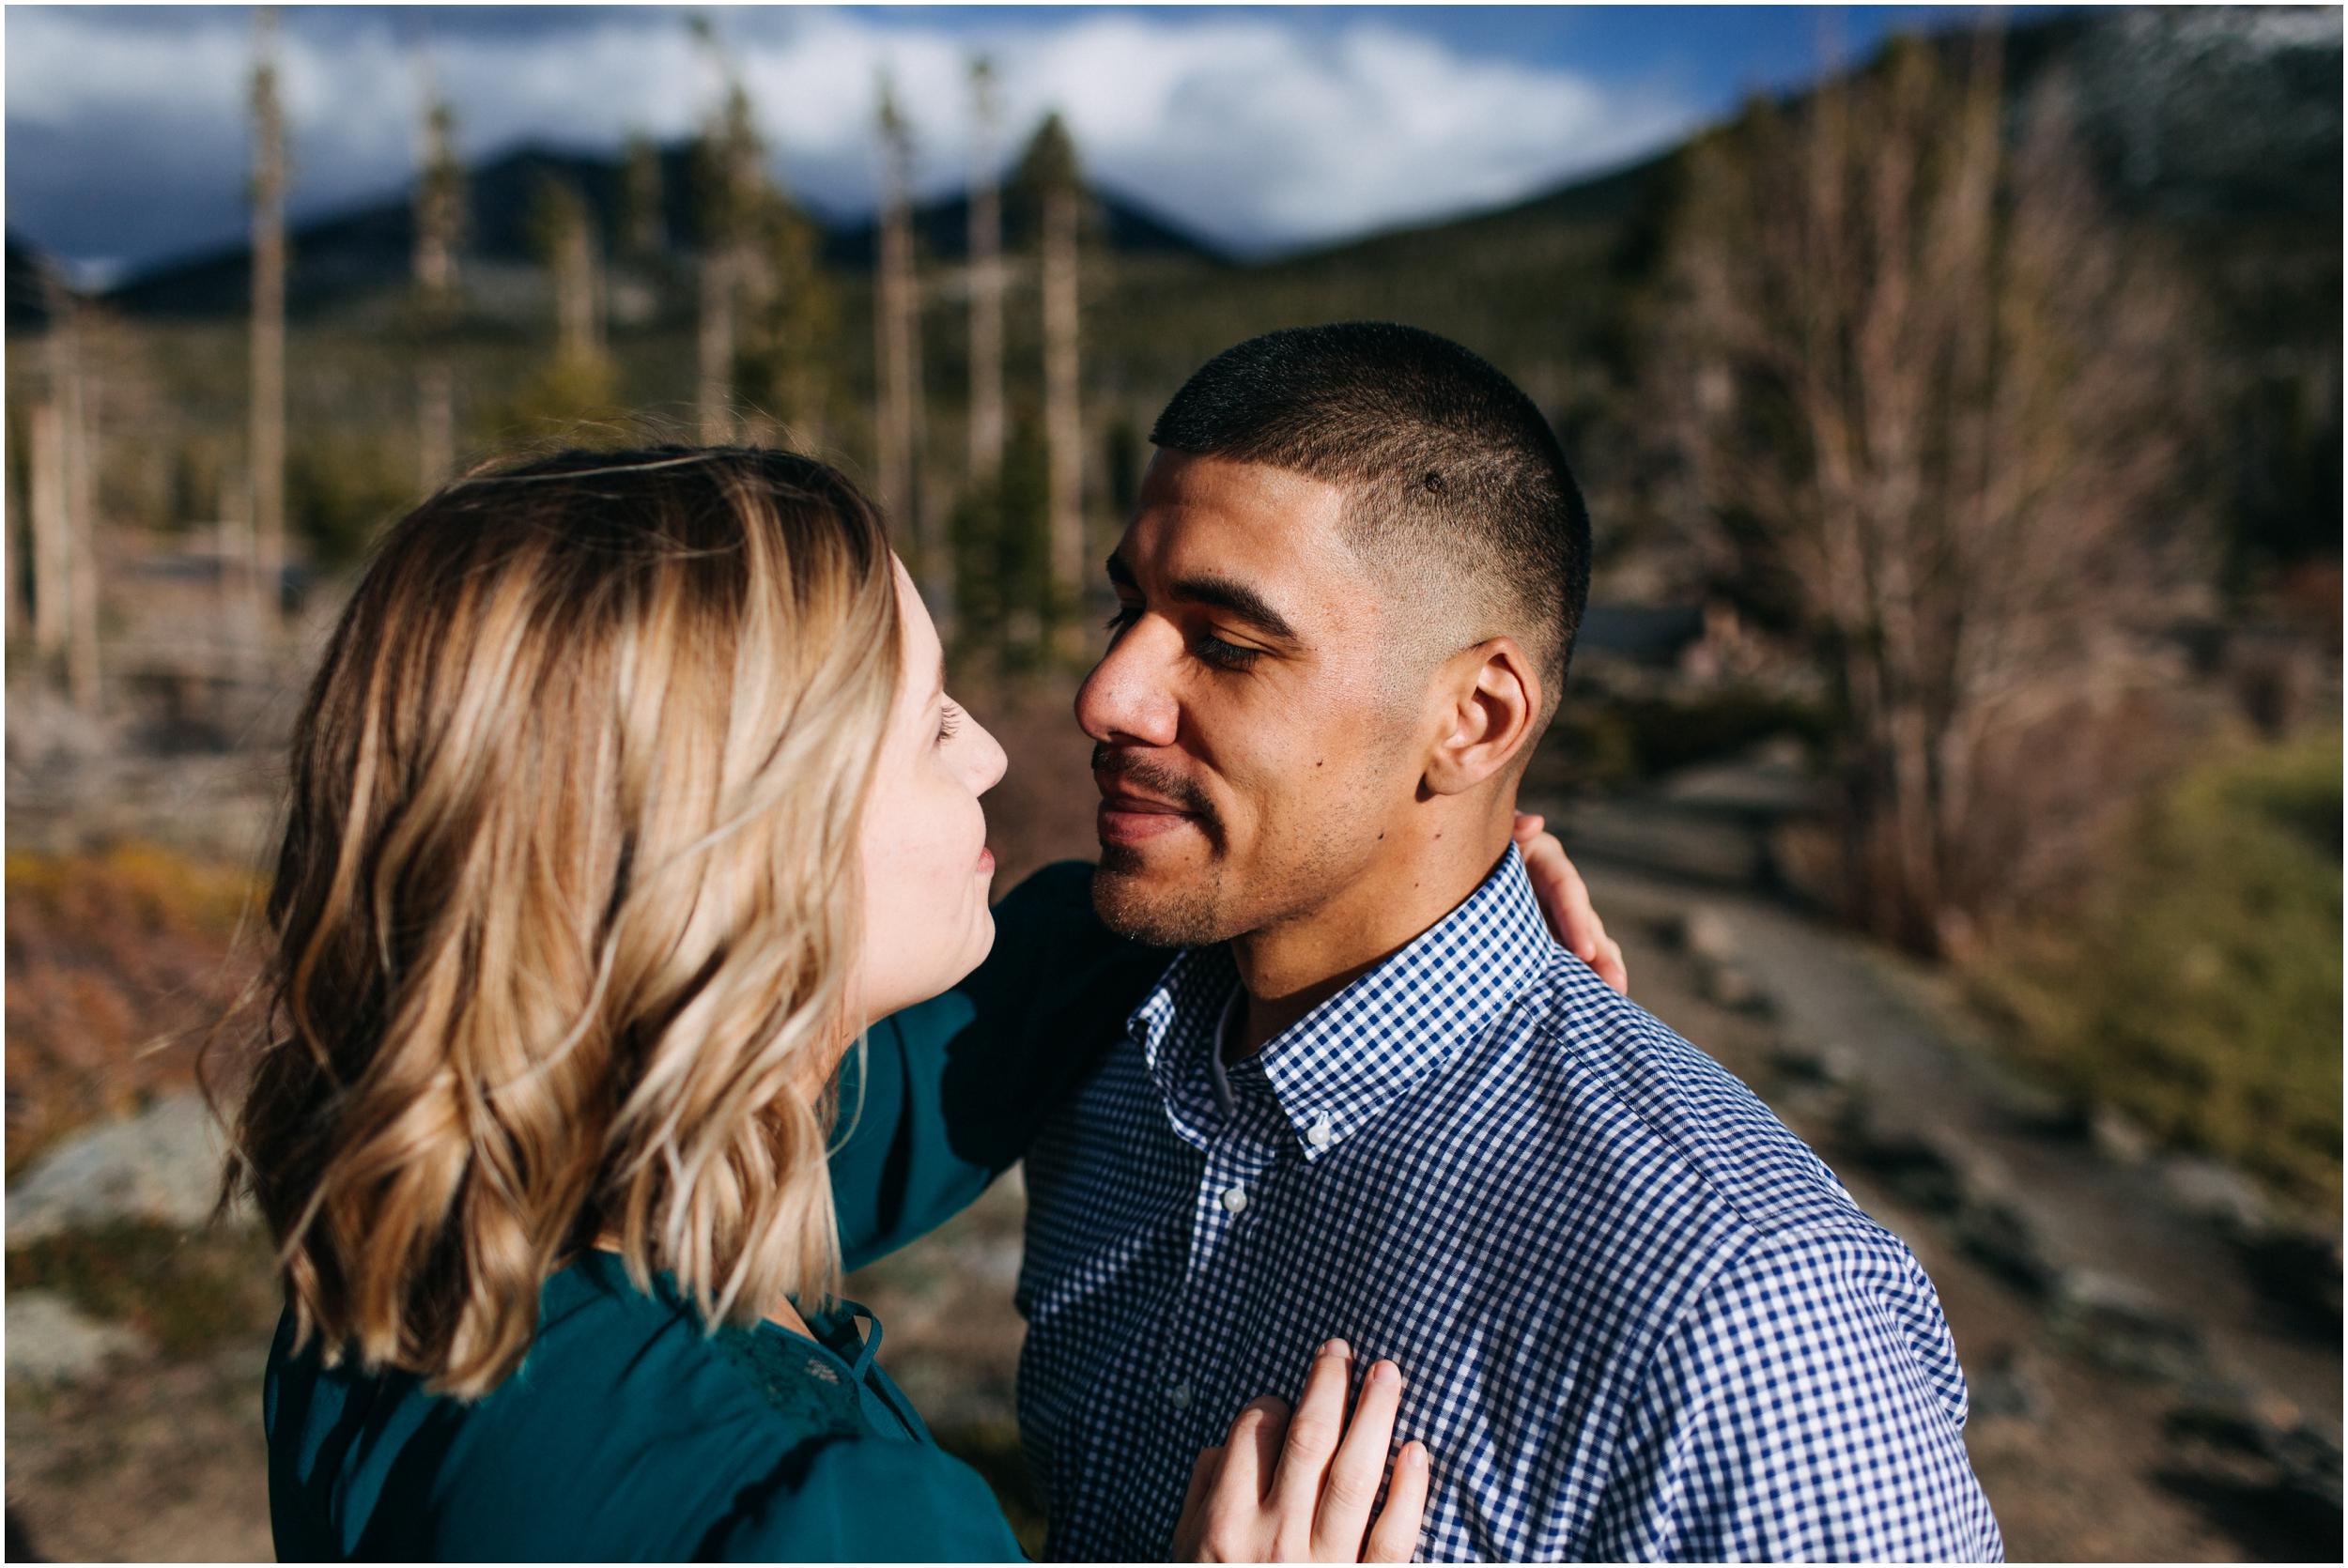 rocky-mountain-national-park-elopement-sprague-lake-colorado-adventure-wedding-photographer_taylor-powers_43.jpg